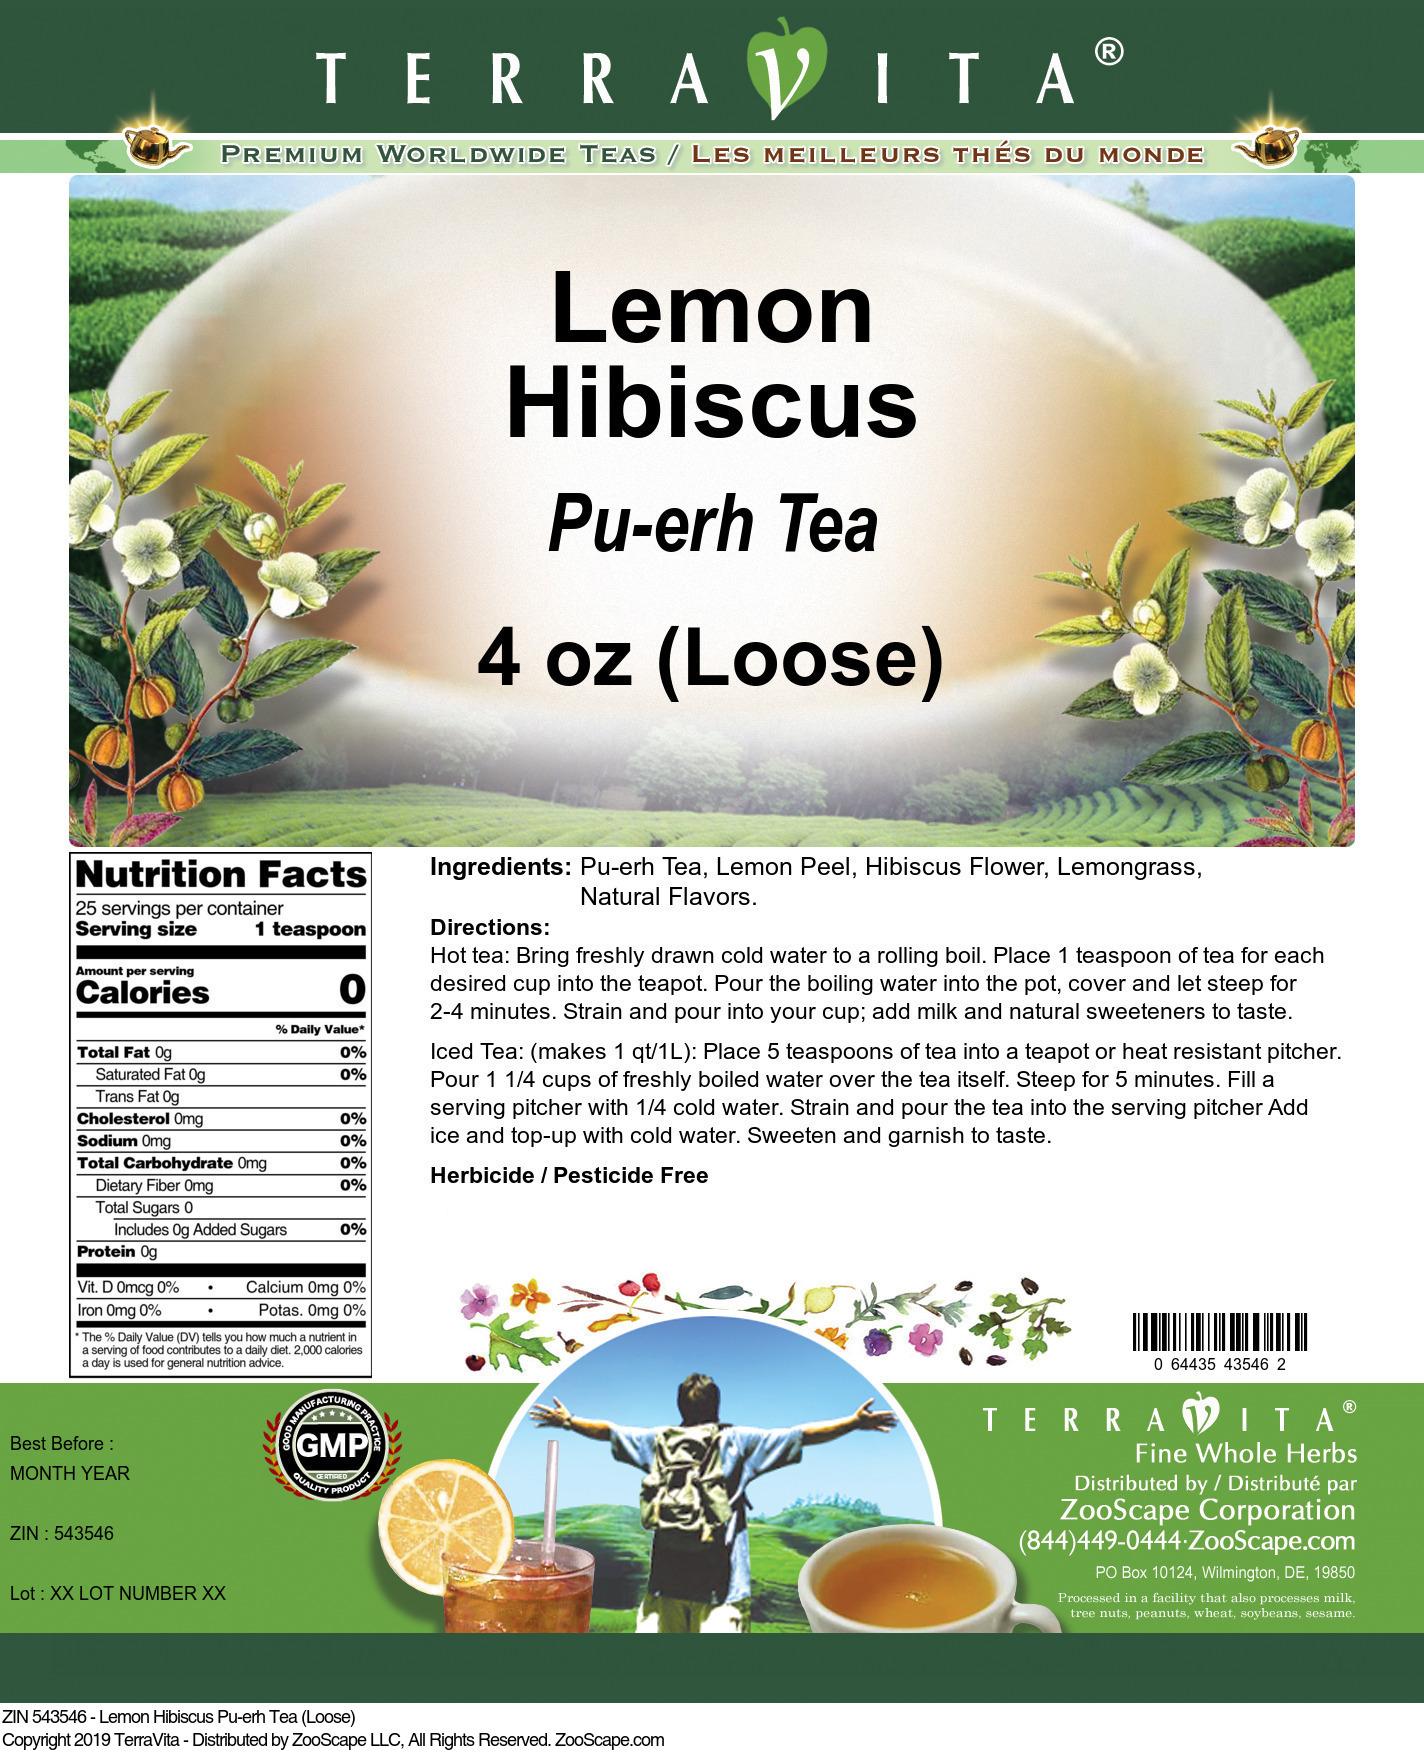 Lemon Hibiscus Pu-erh Tea